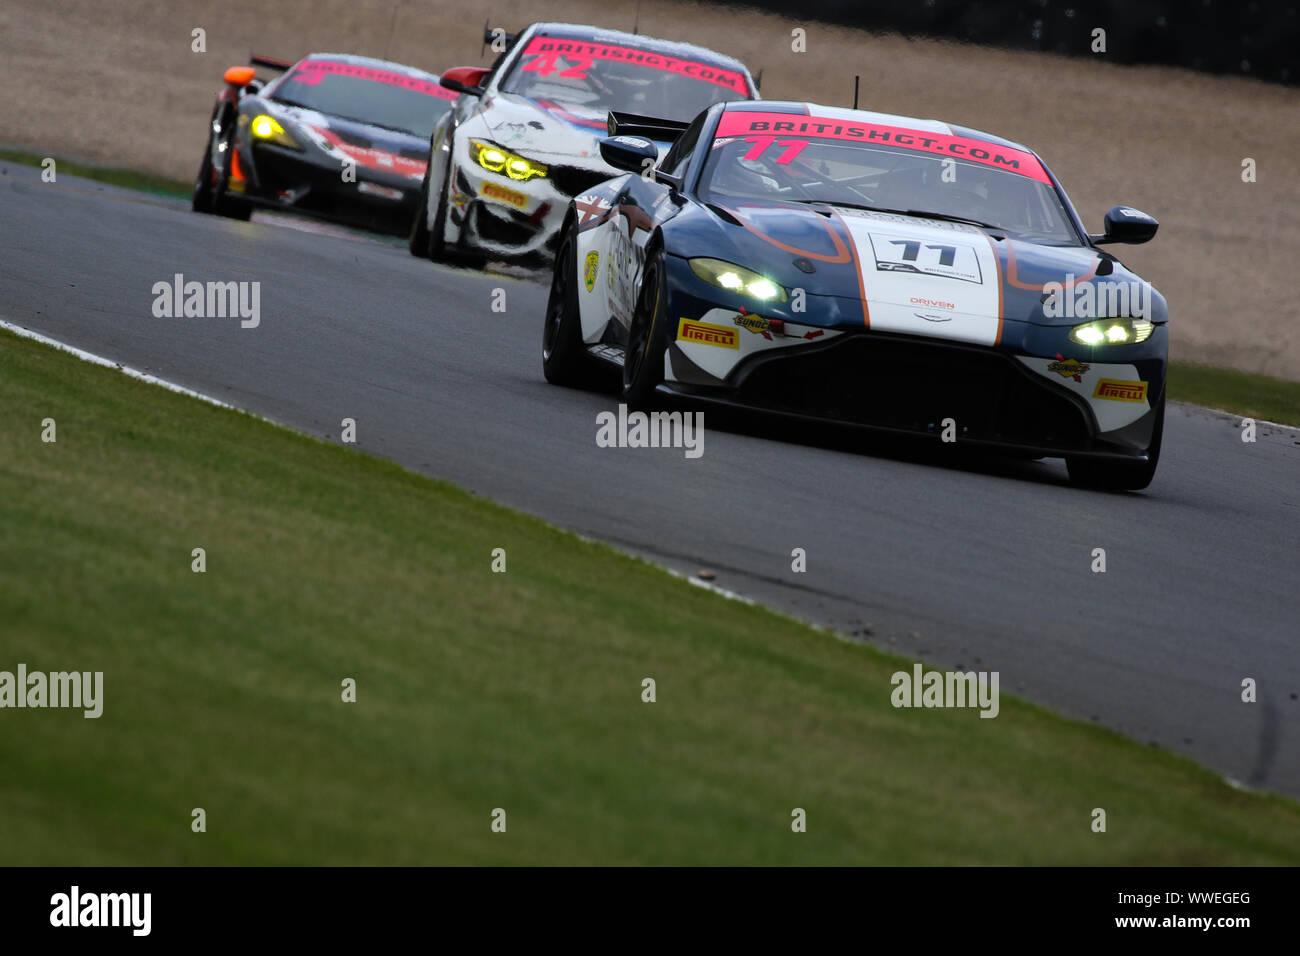 Derby Uk 15th Sep 2019 Beechdean Amr Aston Martin Vantage Amr Gt4 11 Driven By Kelvin